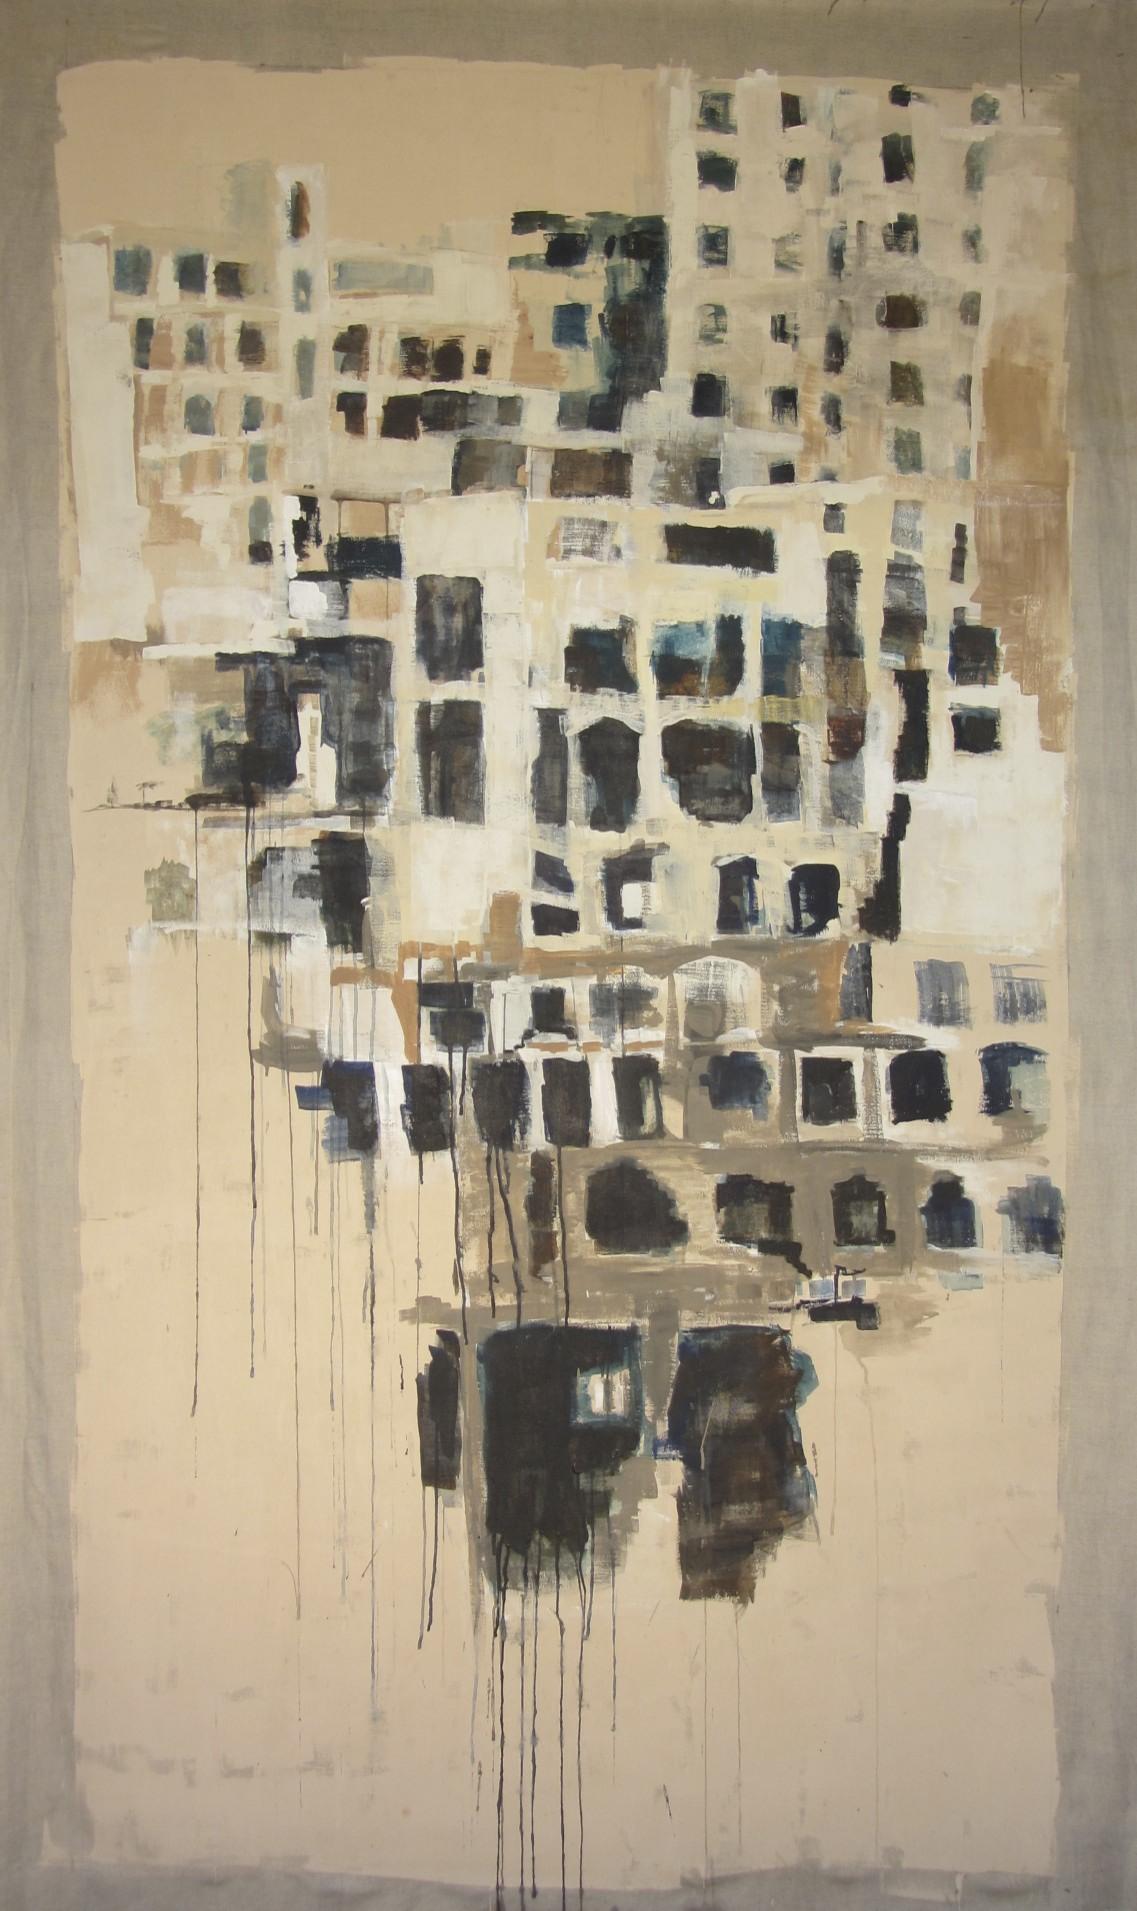 Syrië | latex op linnen | 225 x 1.20 | Particuliere collectie